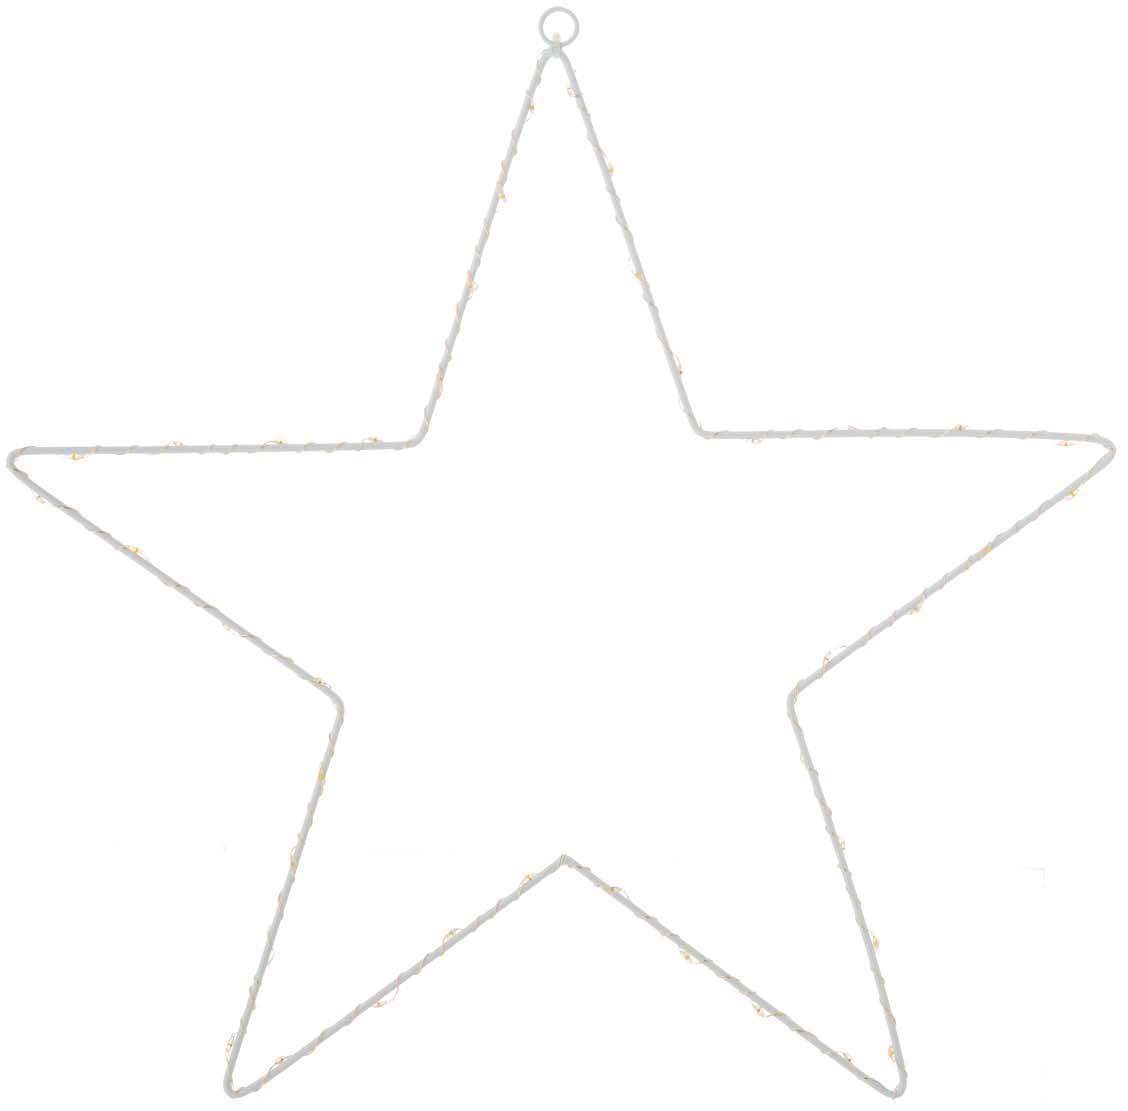 Estrella luminosa LED Silhouet, Metal pintado, Blanco, Ancho 40 x Alto 40 cm